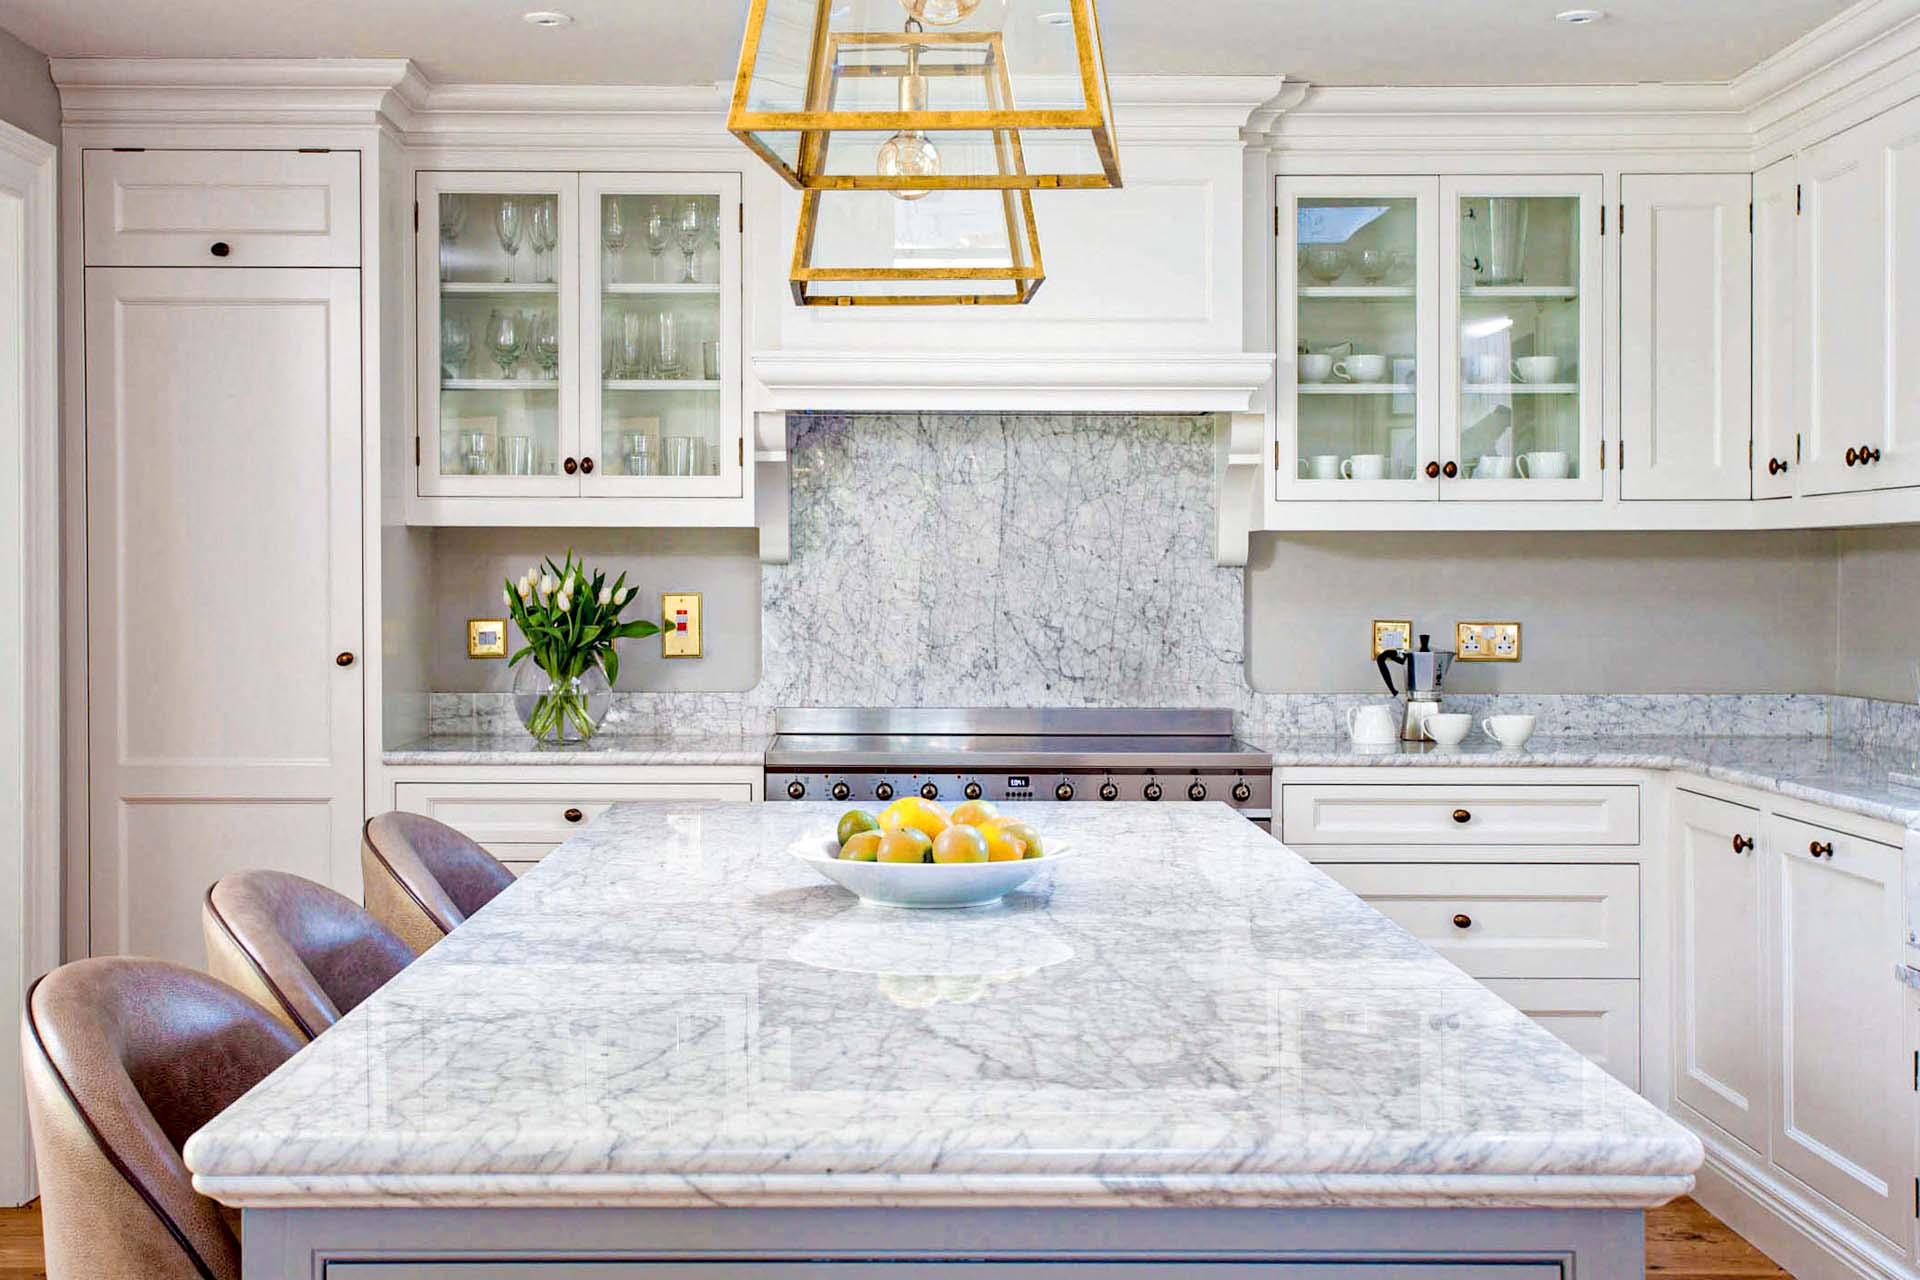 marble worktops kitchen problems staining 110818